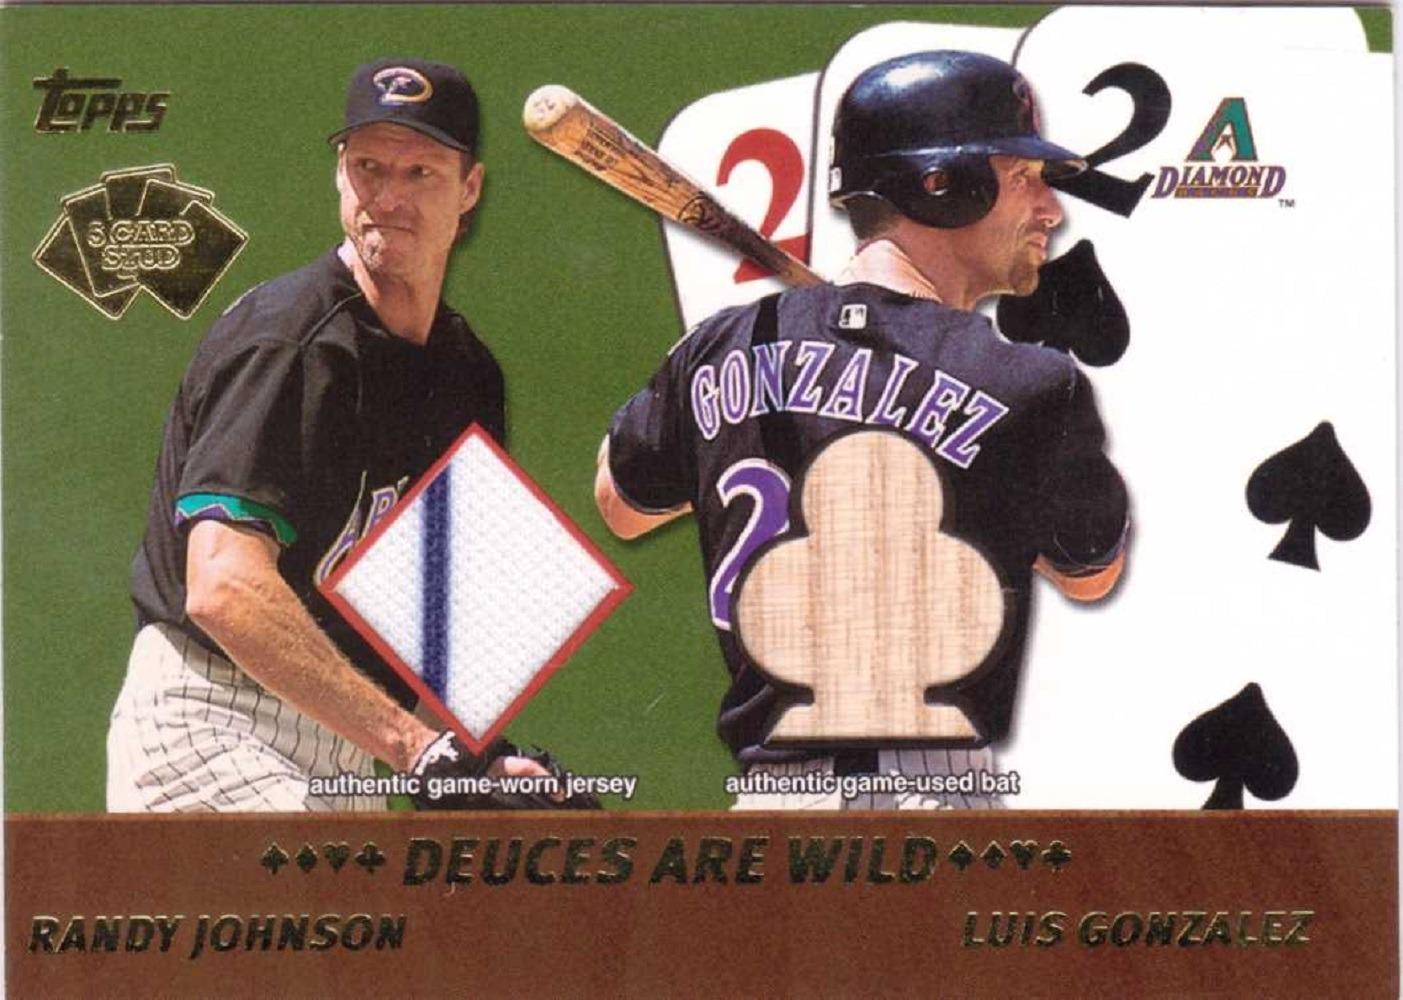 Randy Johnson / Luis Gonzalez 2002 Topps Five Card Stud Deuces Wild Dual Relic